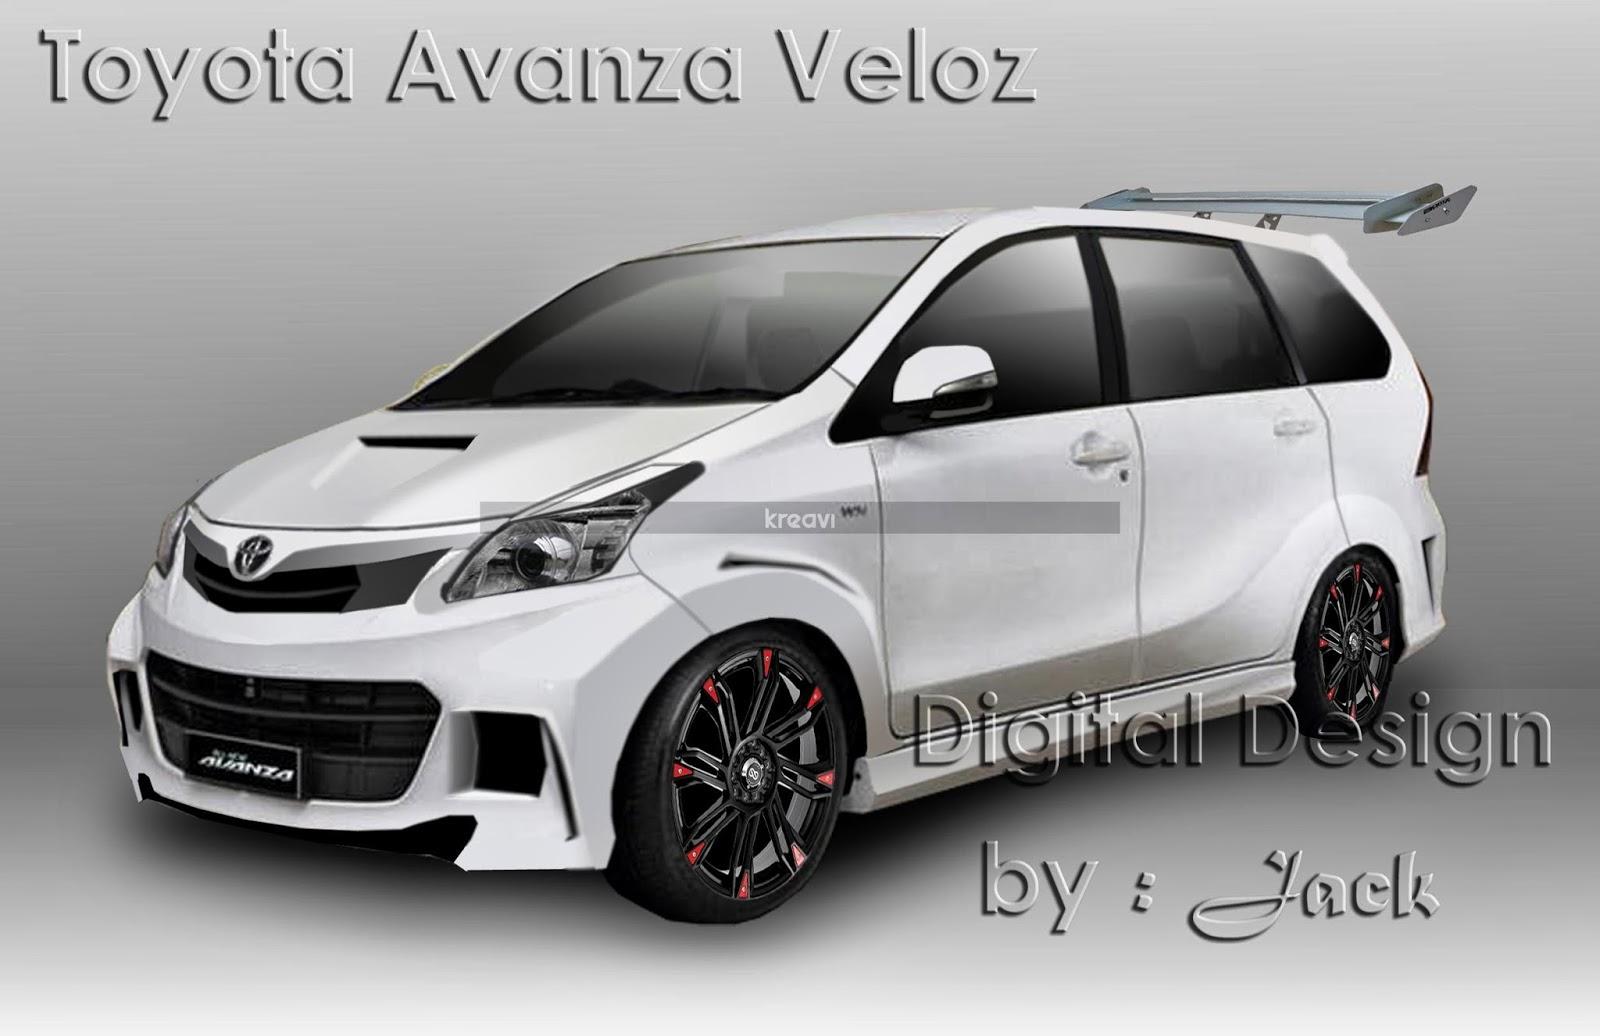 Pasar Harga Mobil Harga Toyota Avanza Veloz Baru